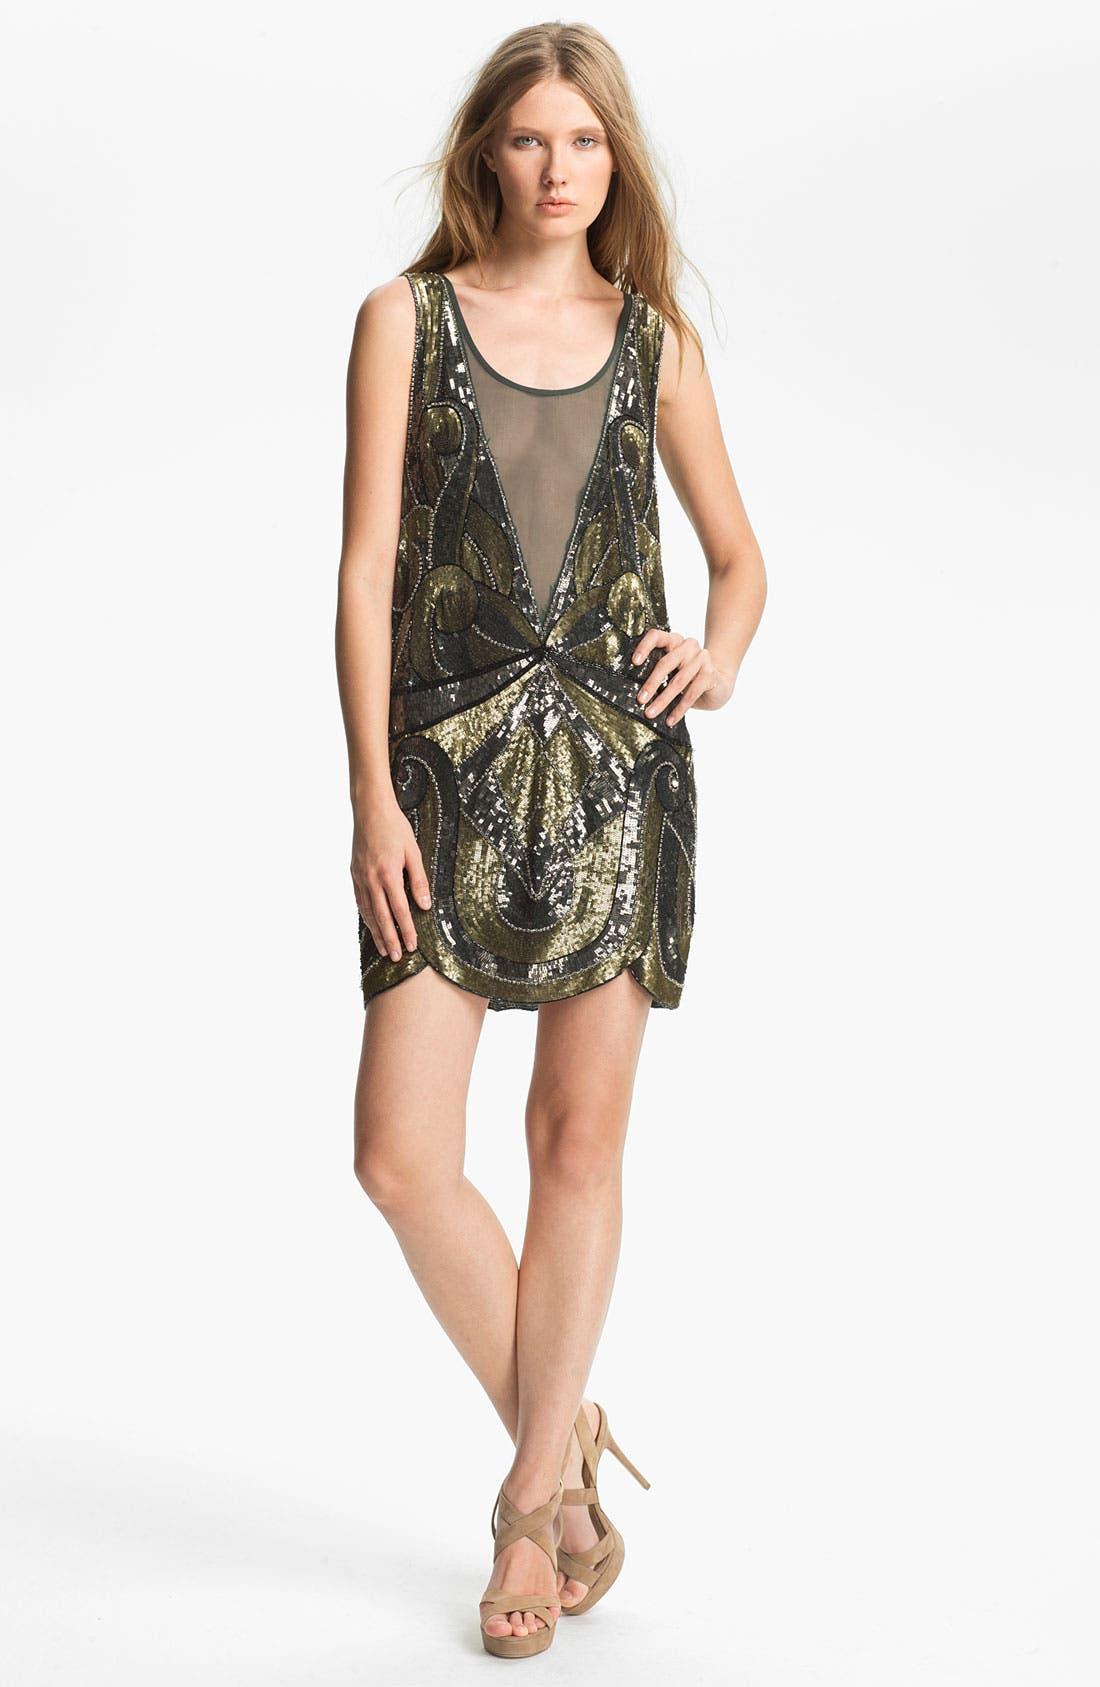 Alternate Image 1 Selected - Haute Hippie Embellished Tank Dress